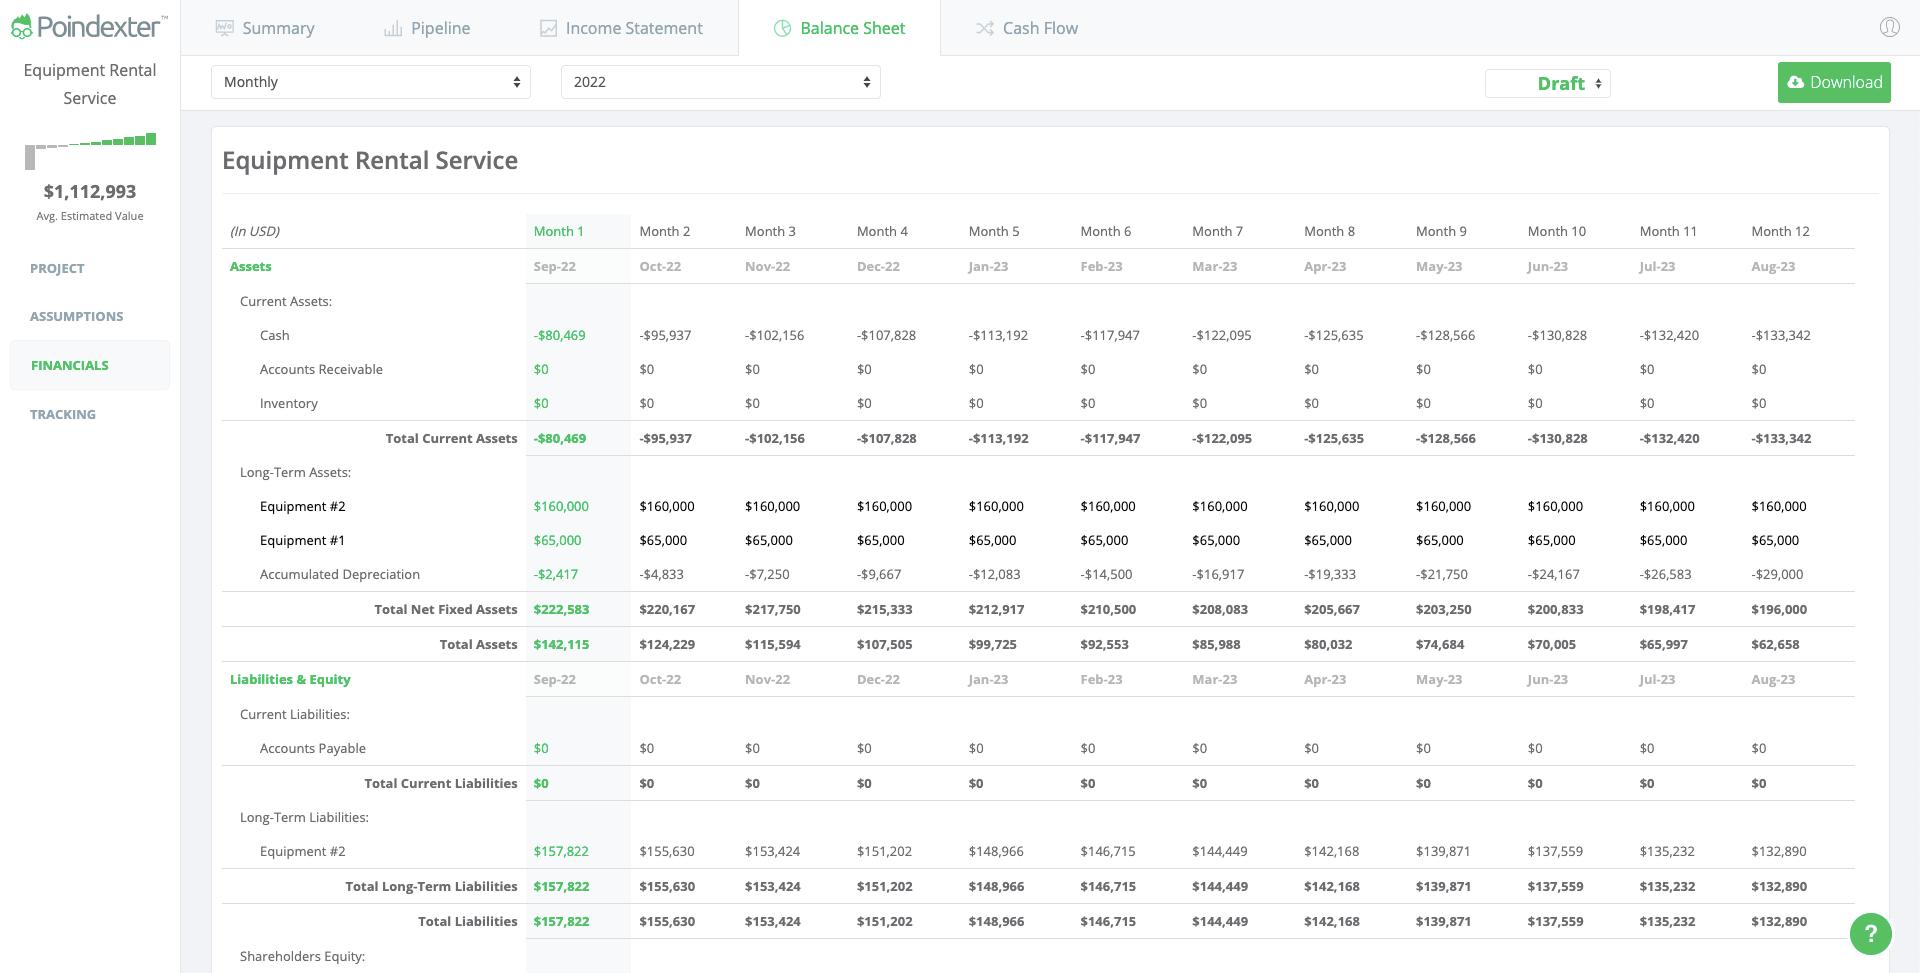 Equipment Rental Service Pro forma Balance Sheet